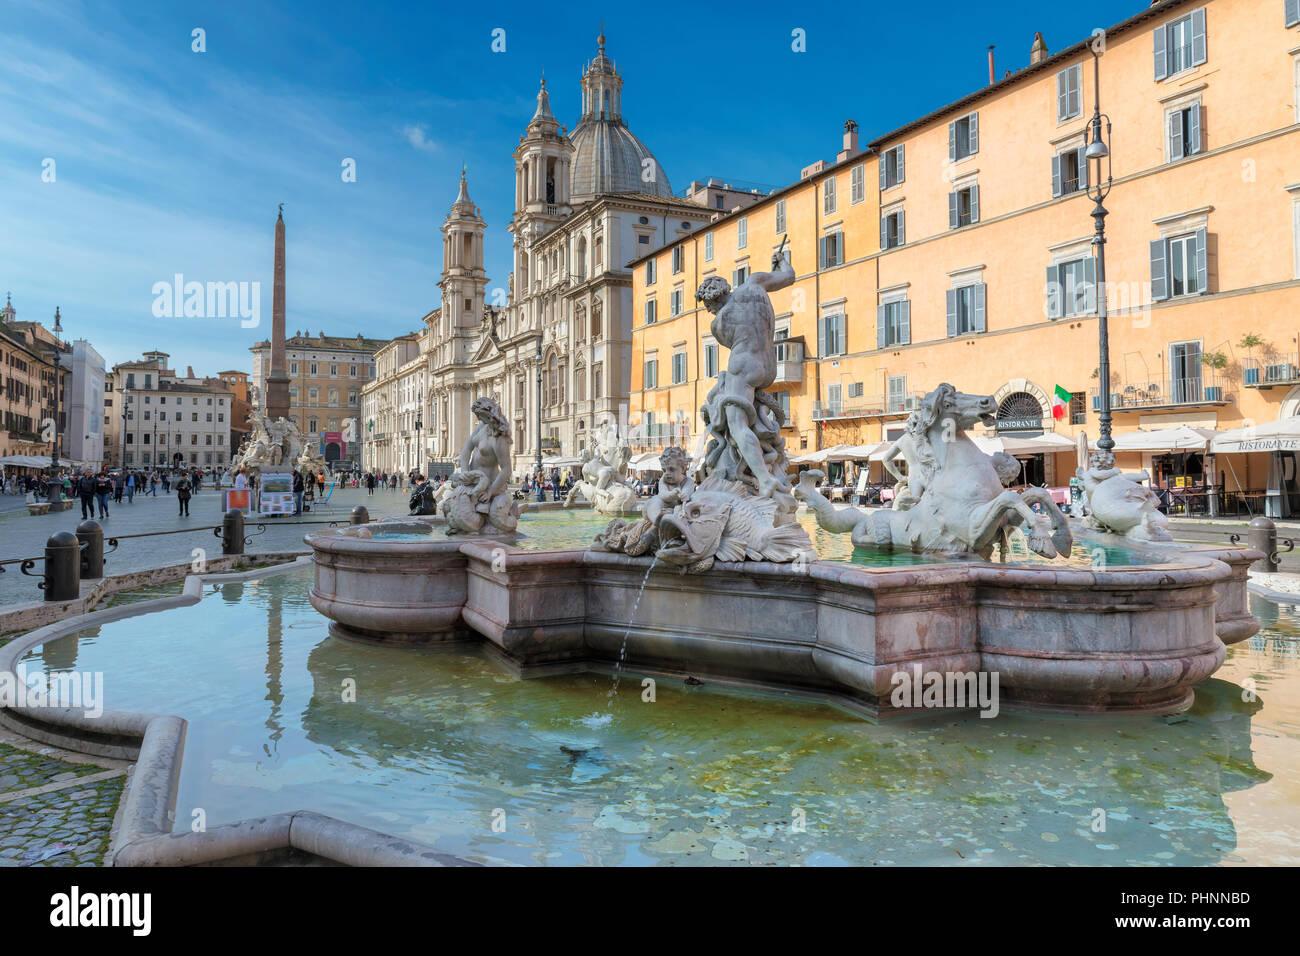 Piazza Navona en mañana en Roma, Italia, Europa. Imagen De Stock